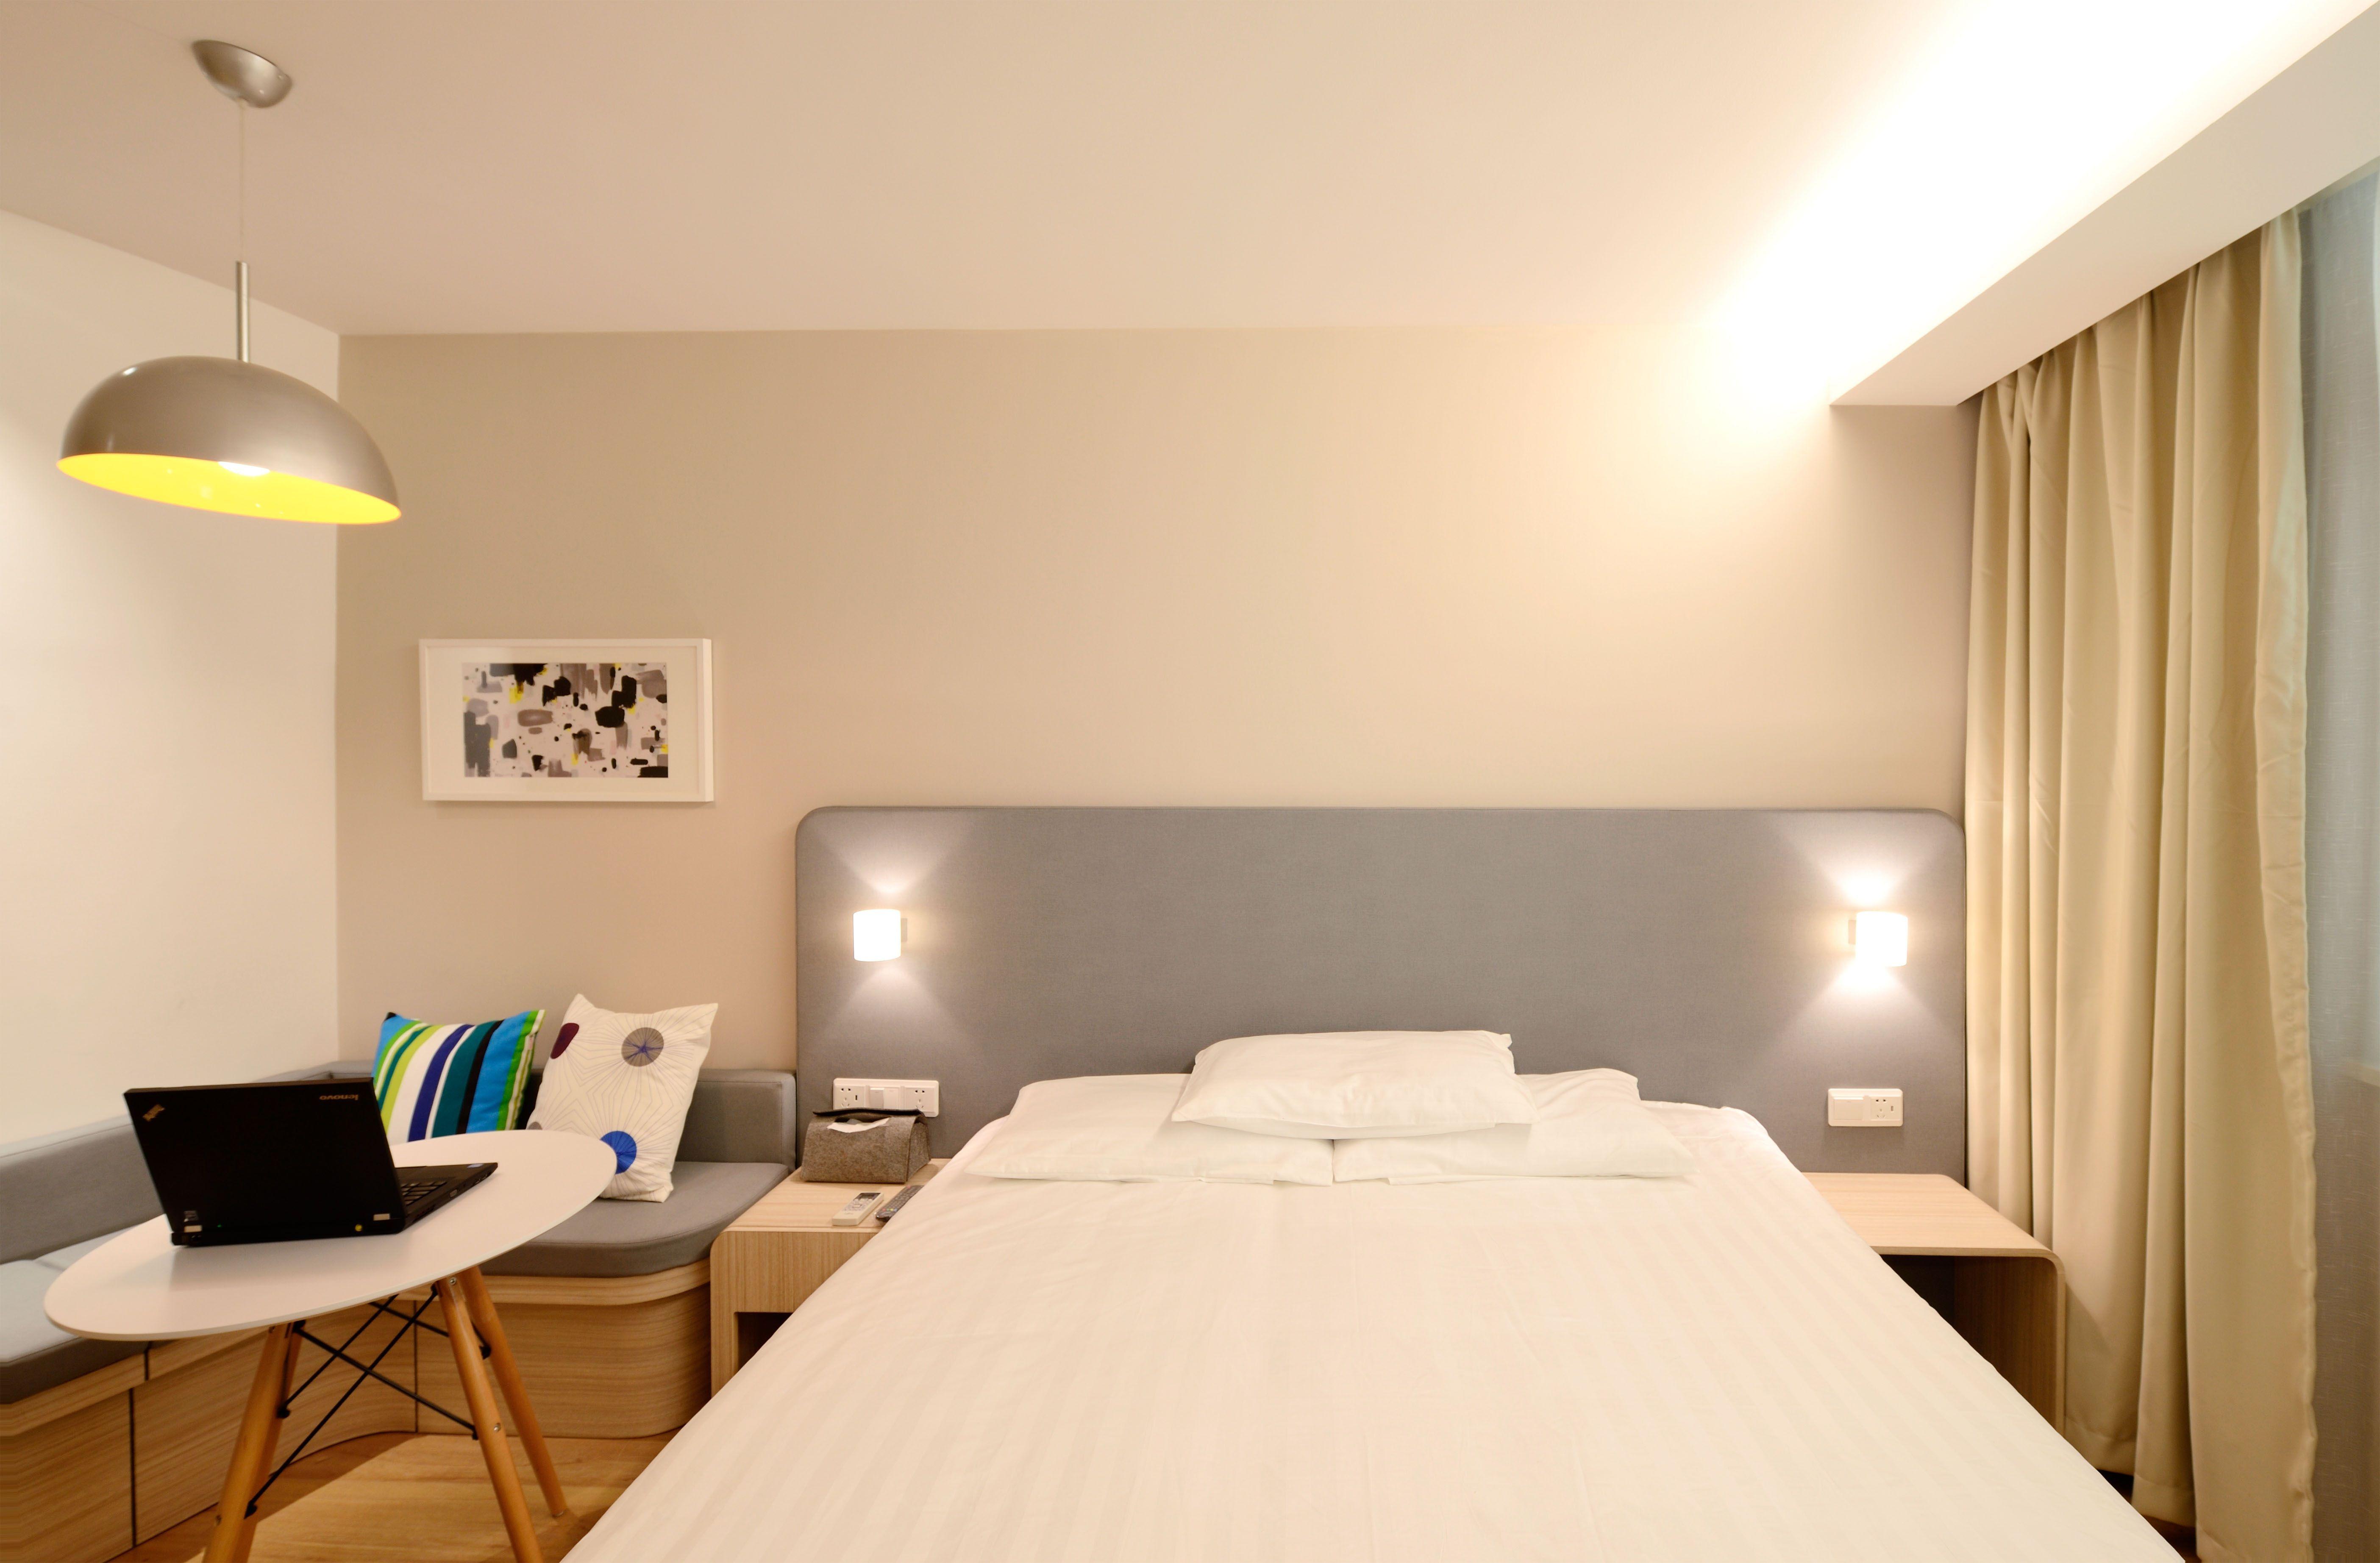 Miracle Sheet Set (Supima) | Bedroom decor inspirations | Pinterest ...